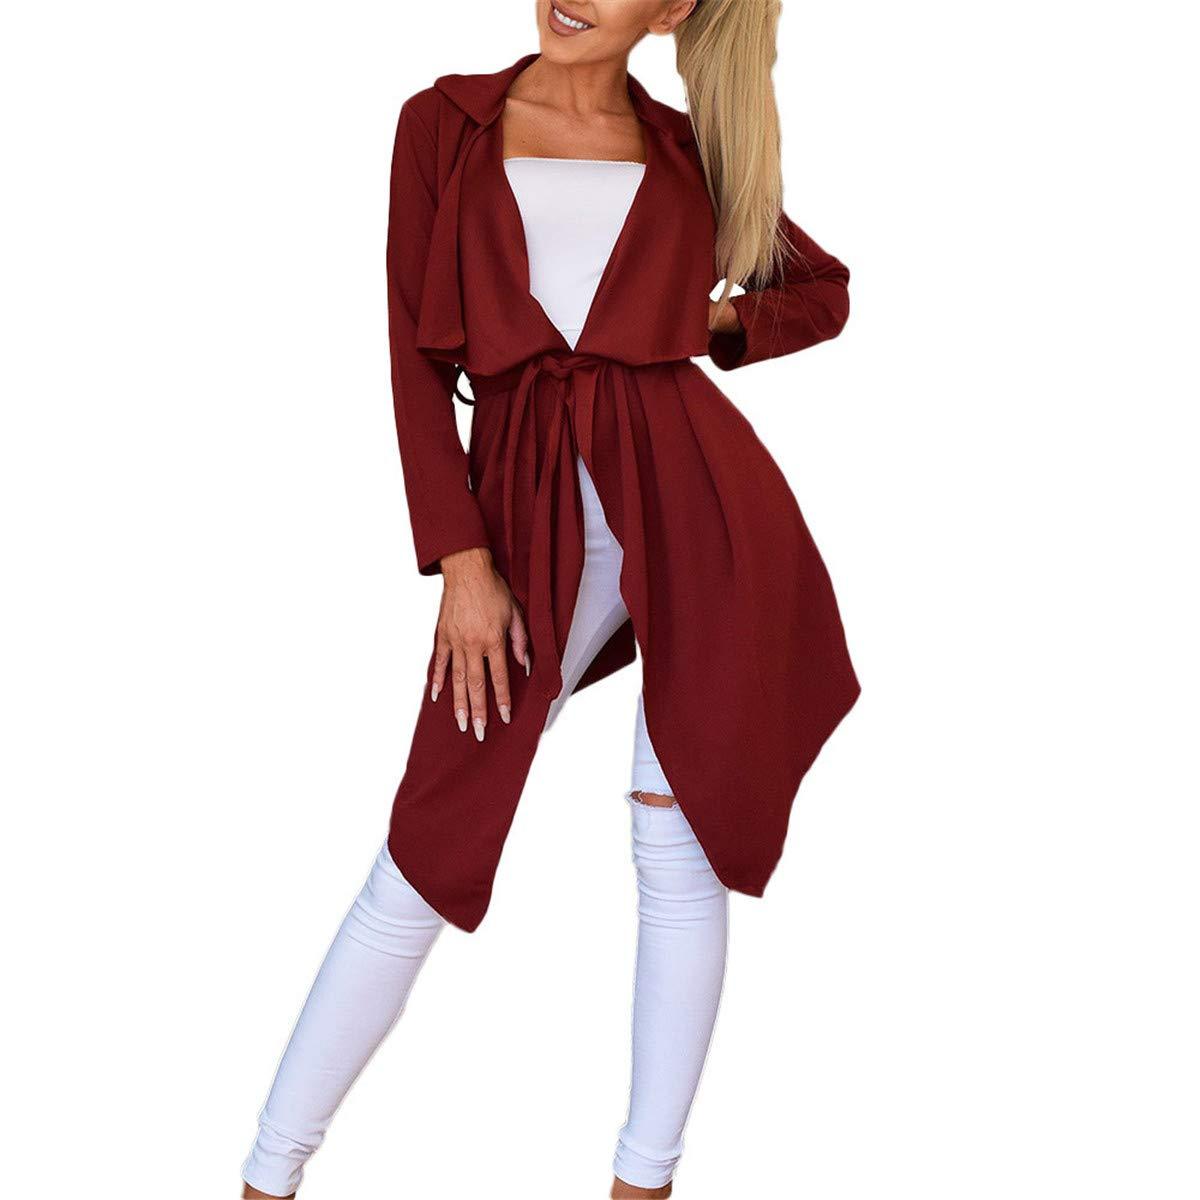 KESEELY Belt Coat Fashion Women Long Sleeve Sweater Casual Long Cardigan Solid Color Coat Jacket